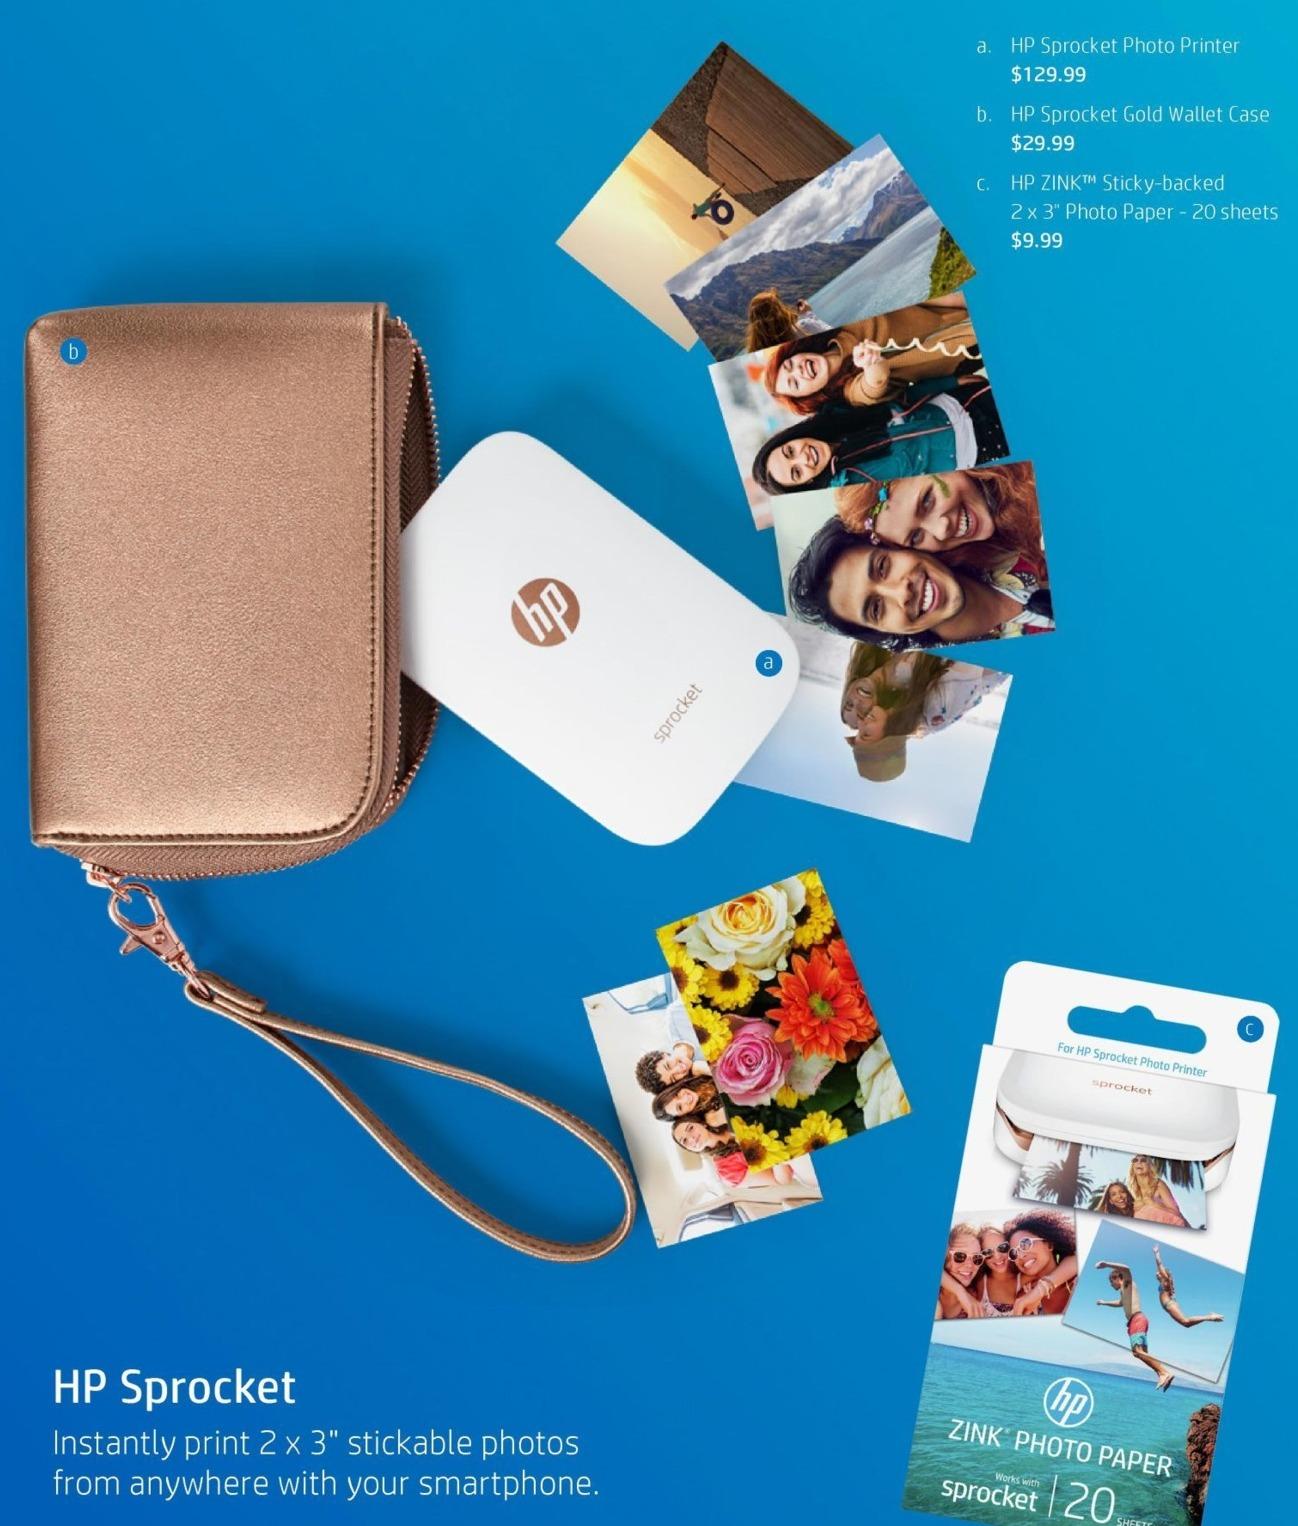 HP Black Friday: HP Sprocket Photo Printer for $129.99